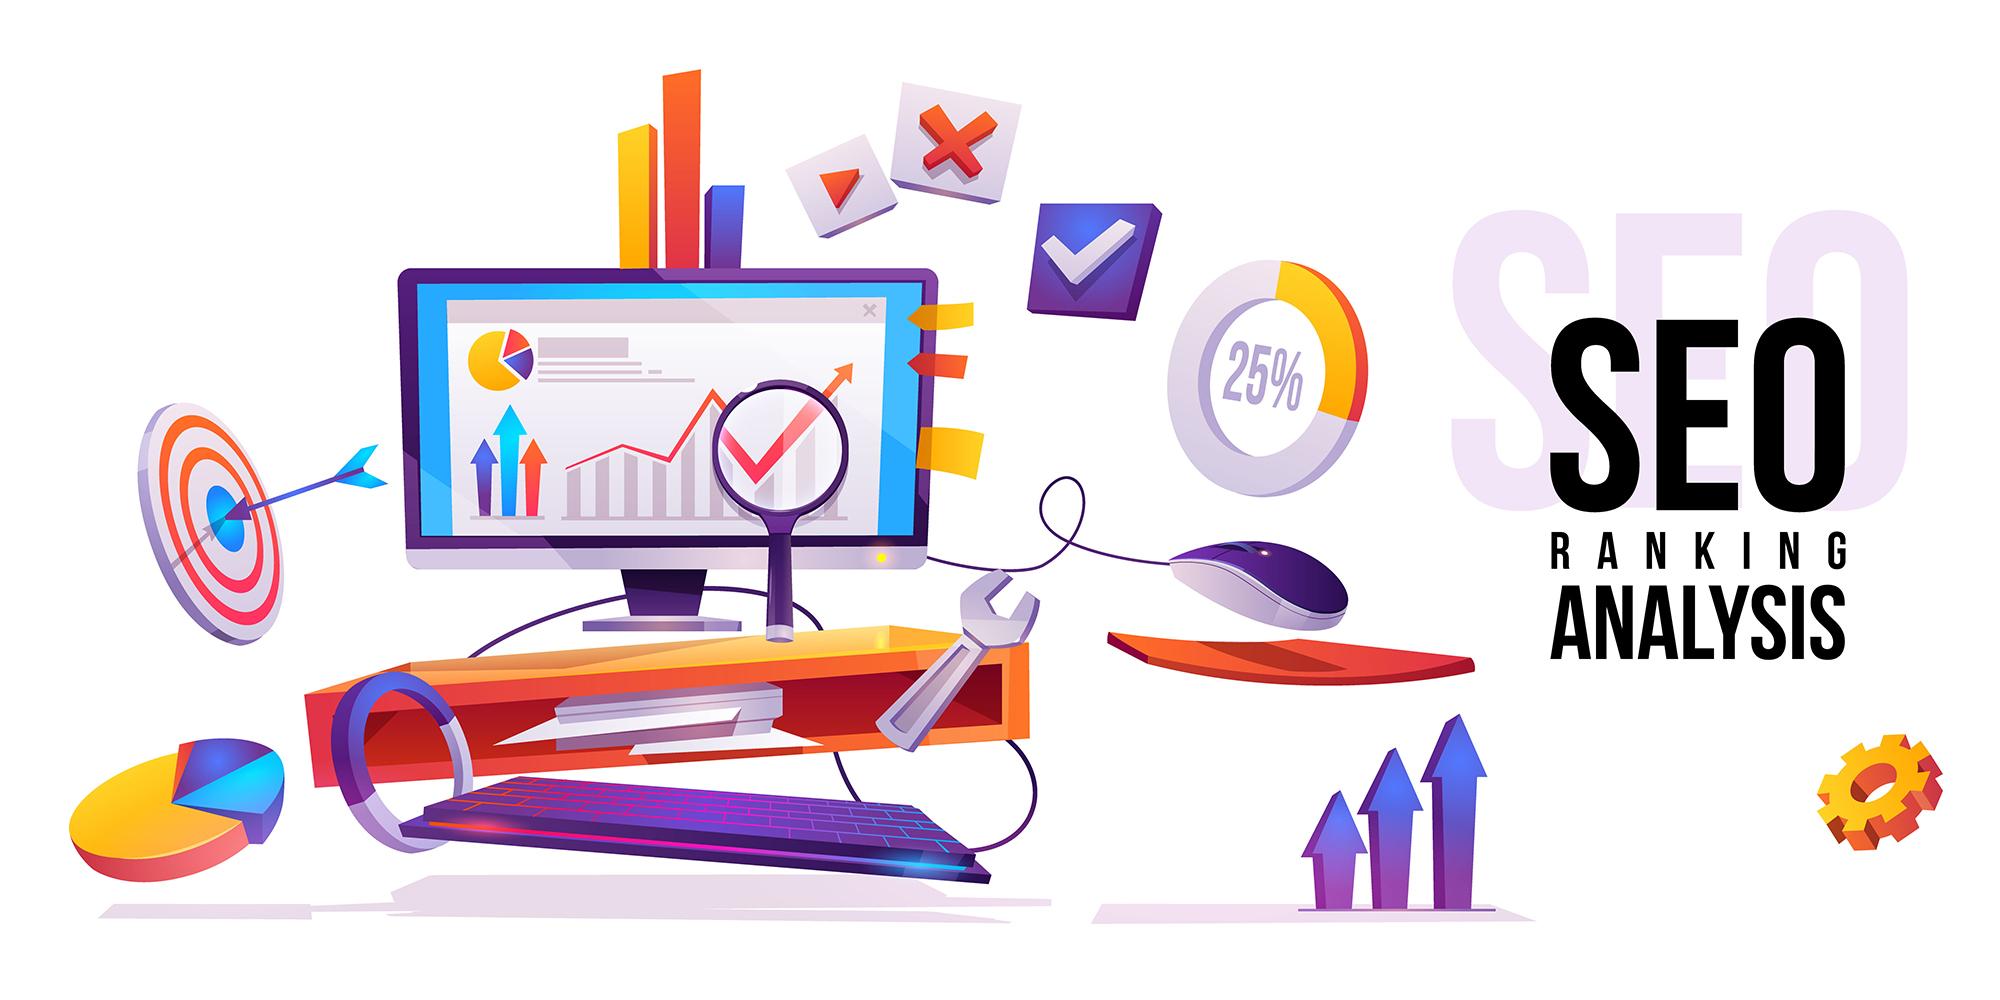 SEO ranking analysis internet technology banner